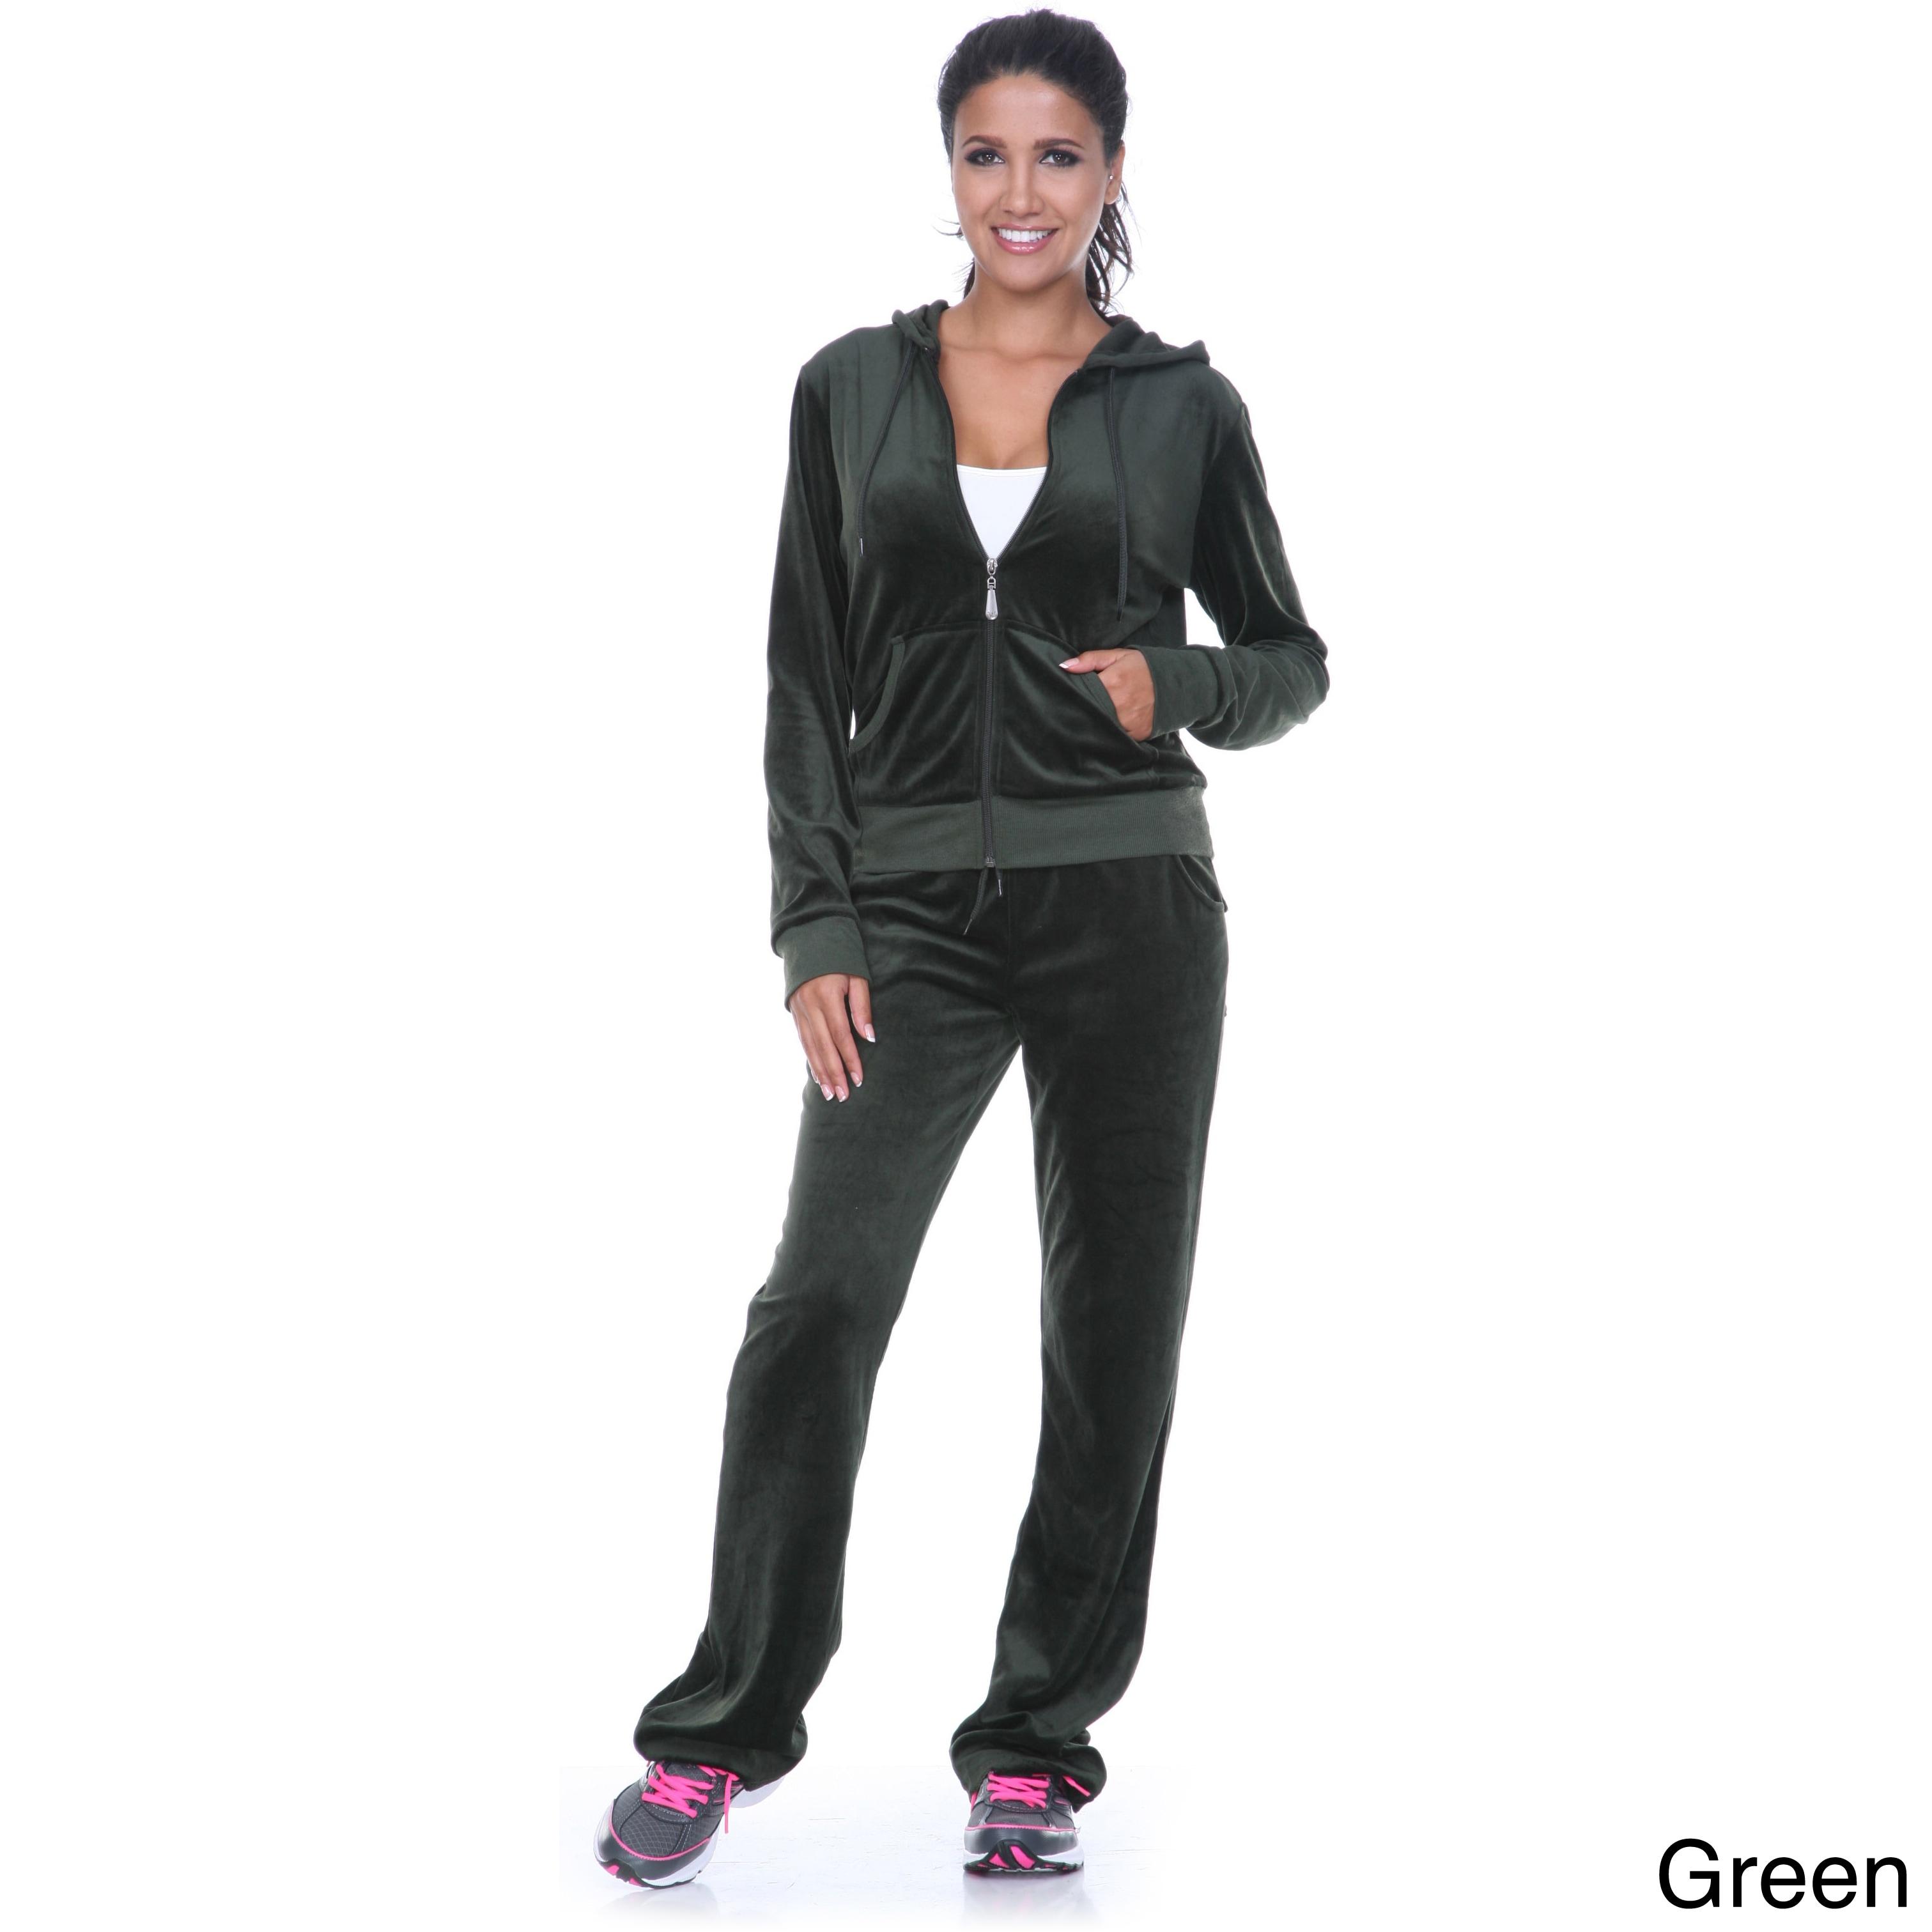 Intelligent 2019 Mens Men Casual Active Suit Zipper Outwear Sportwear Suit Sweatshirt Tracksuit Without Hoodie 2pc Jacket+pants Sets Pleasant In After-Taste Home